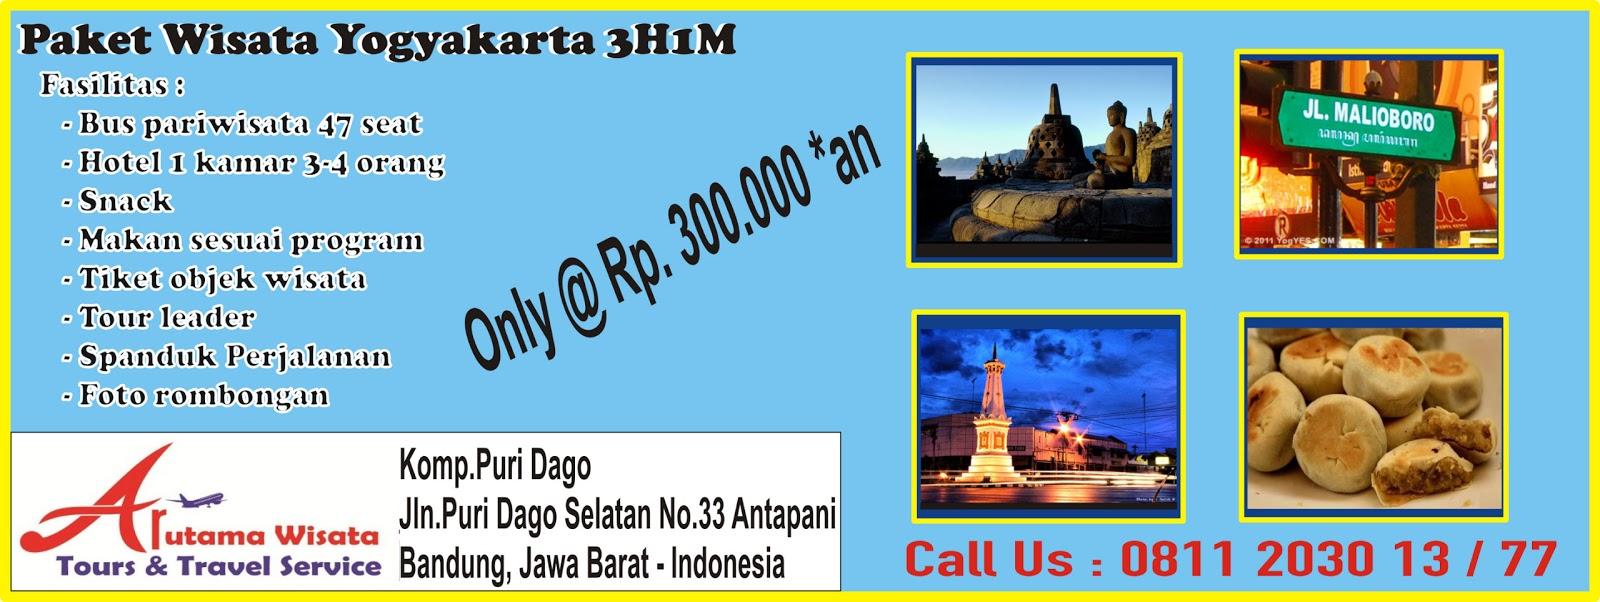 Arutama Wisata Tour & Travel Service